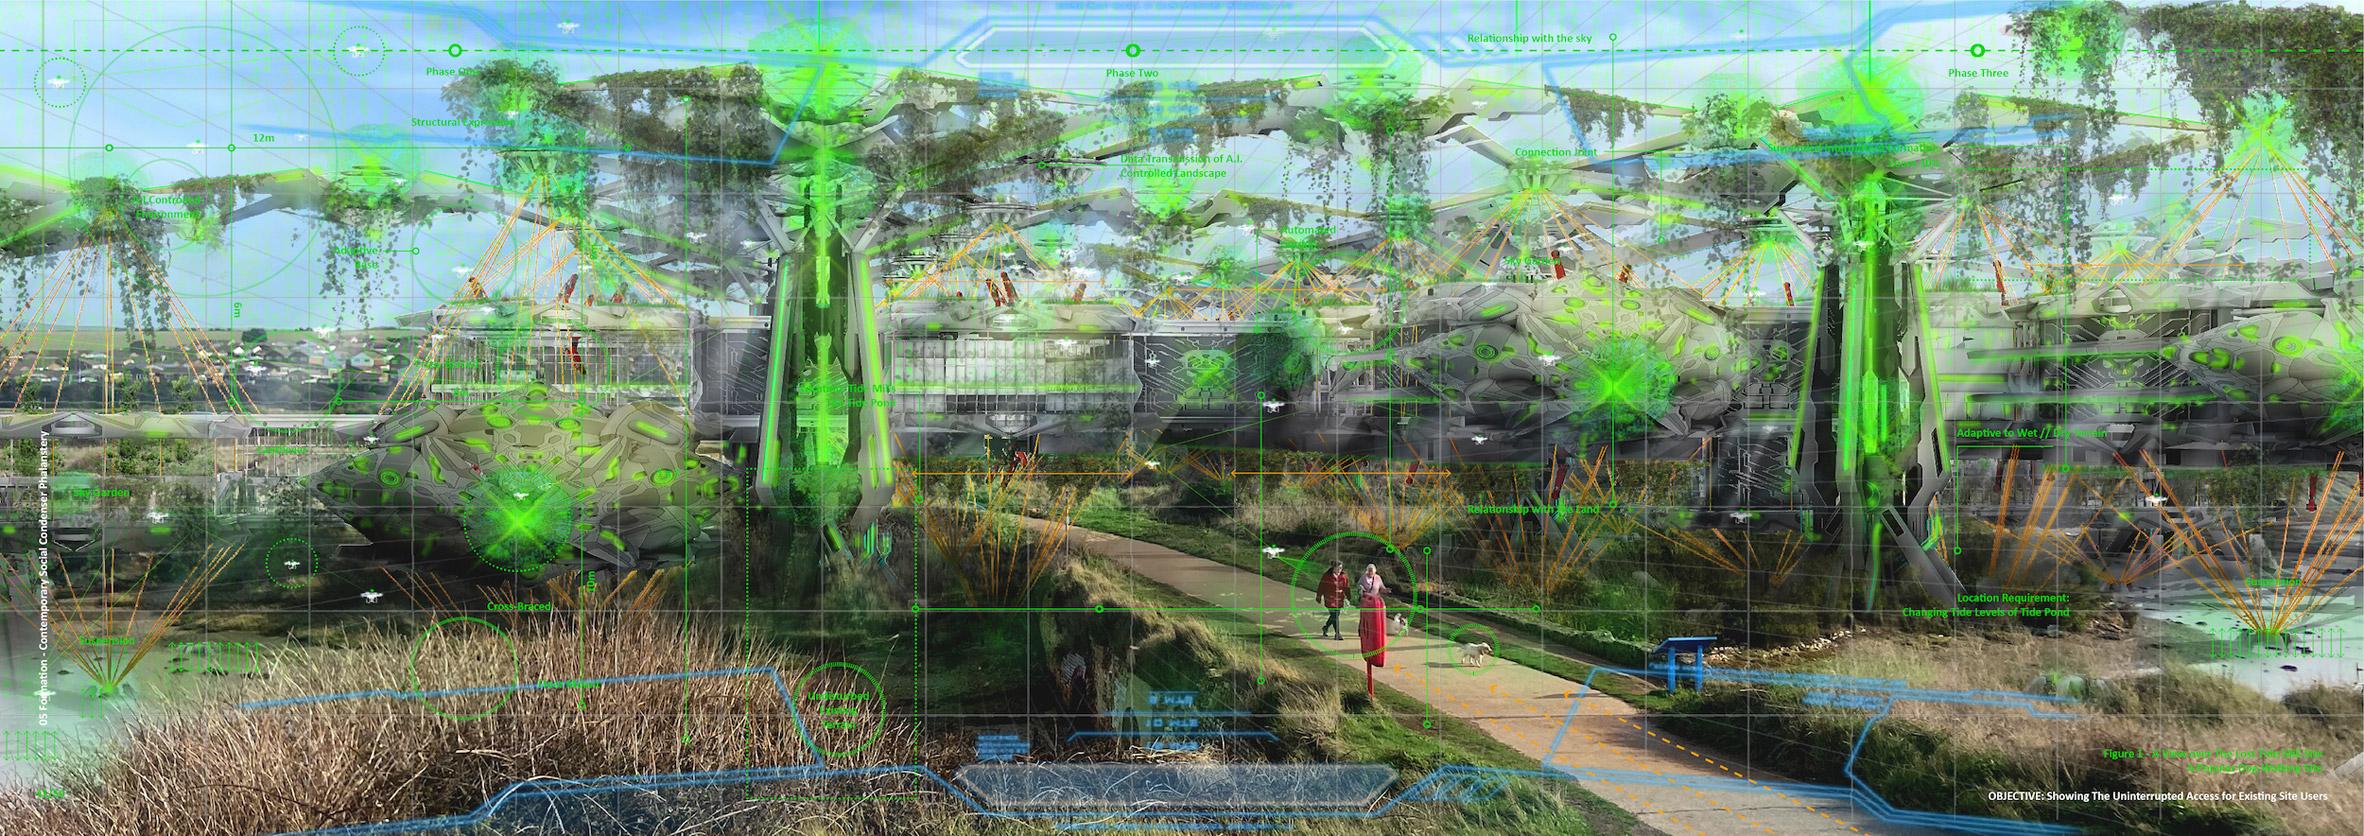 University of Brighton students designed the work